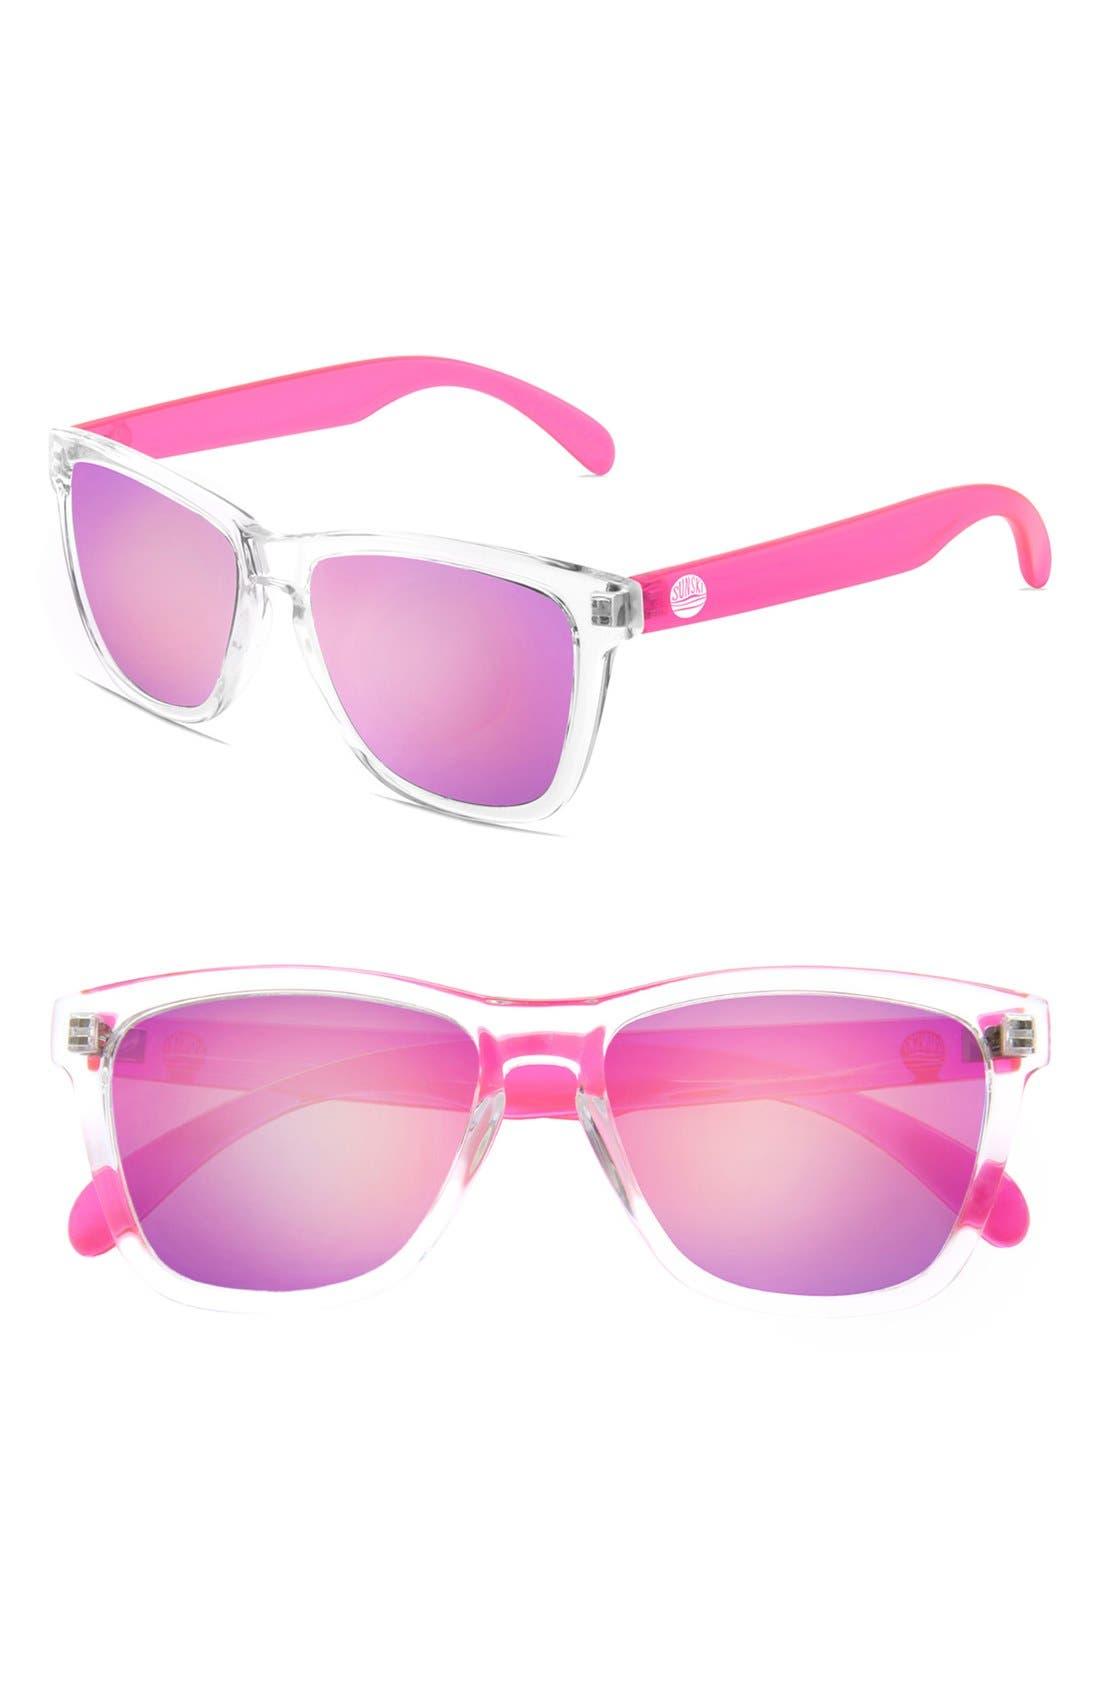 Main Image - Sunski 'Originals' 53mm Retro Polarized Sunglasses